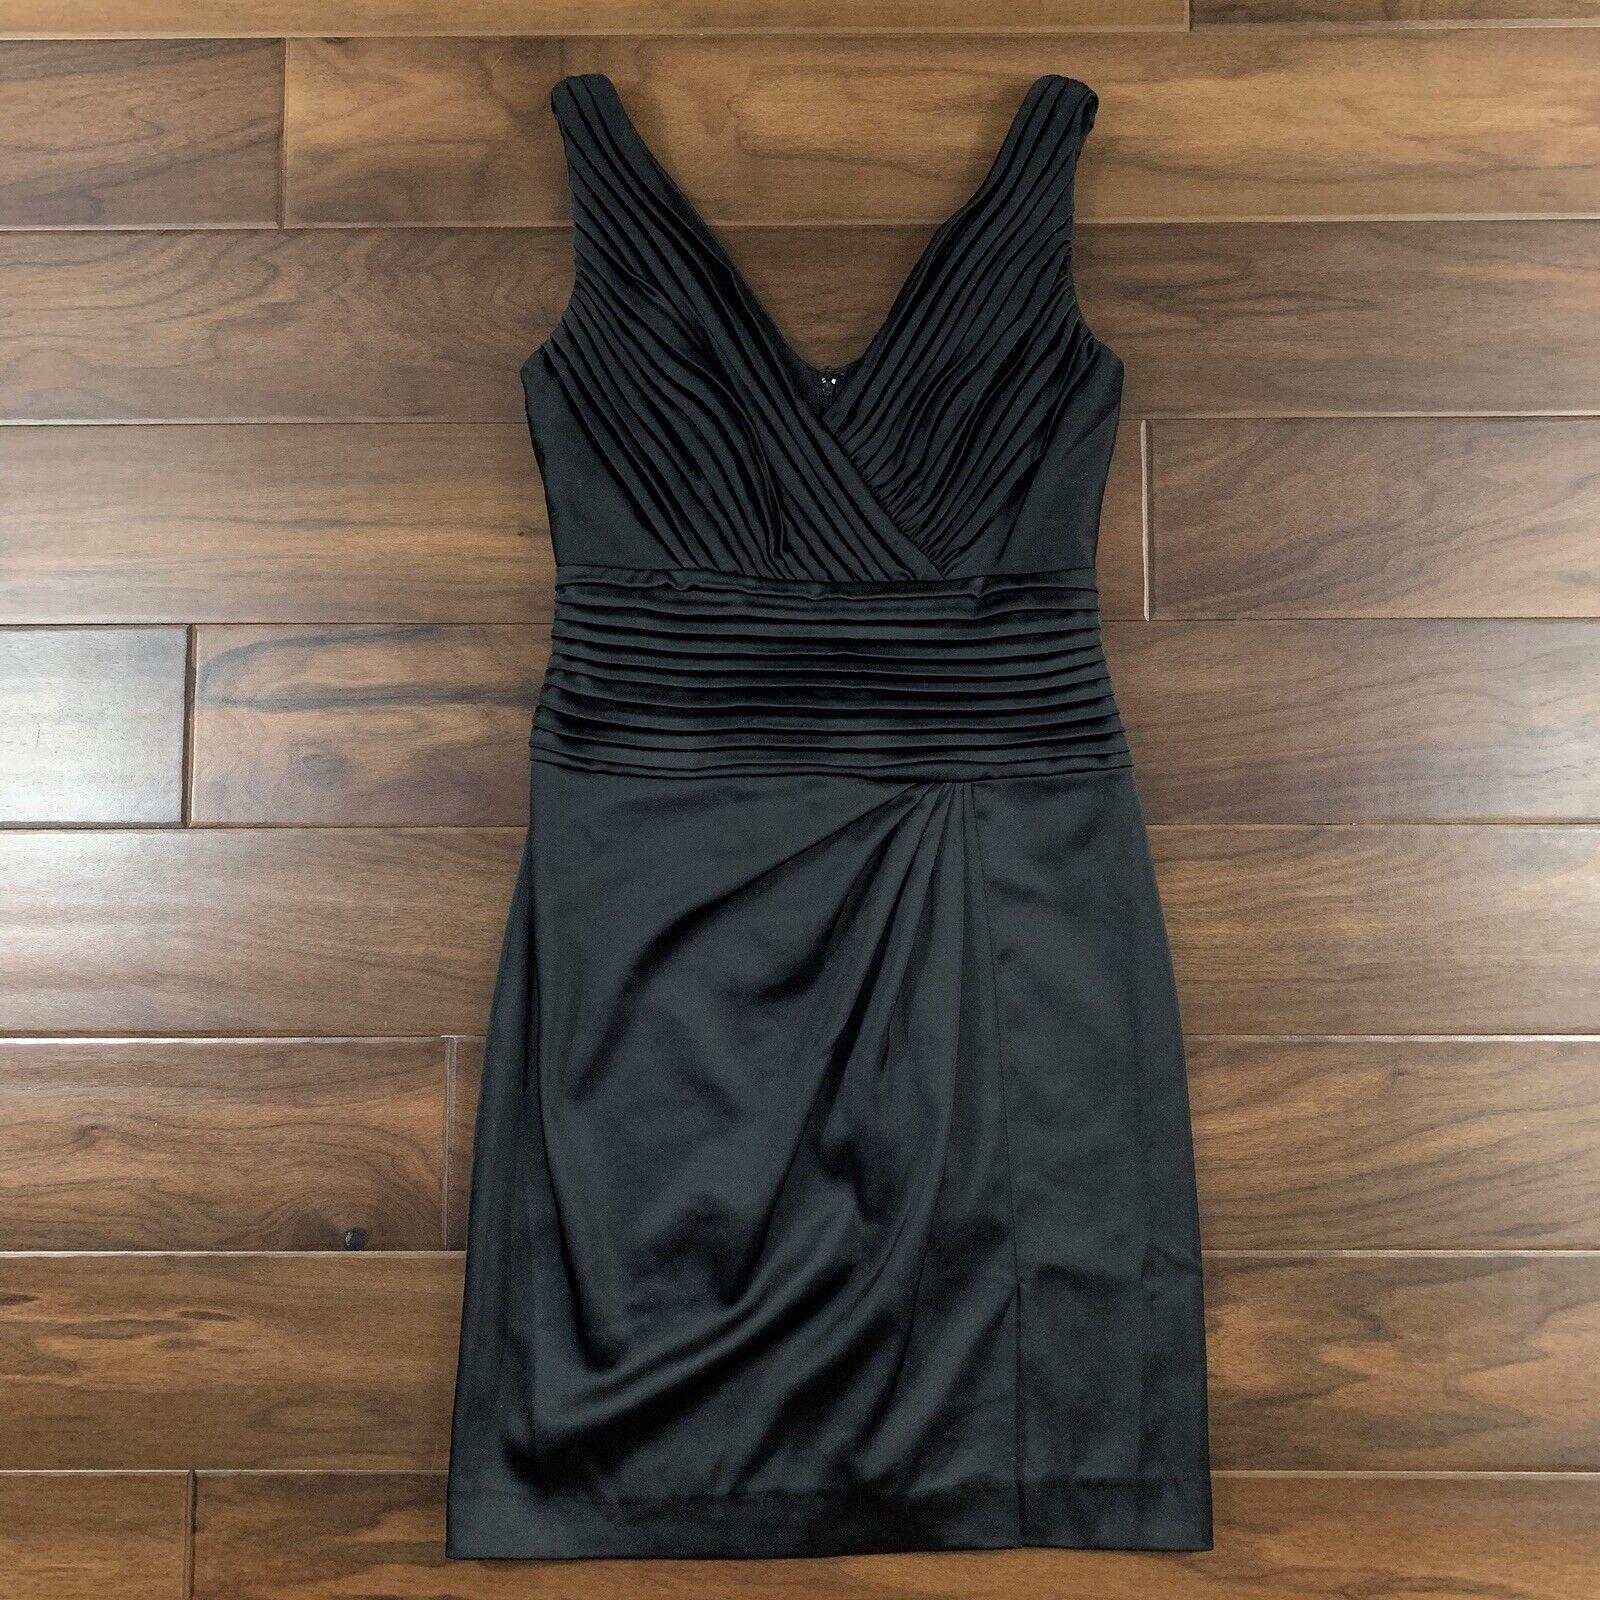 Tadashi Collection damen Größe 4 schwarz Pintuck Pleat Sleeveless Sheath Dress